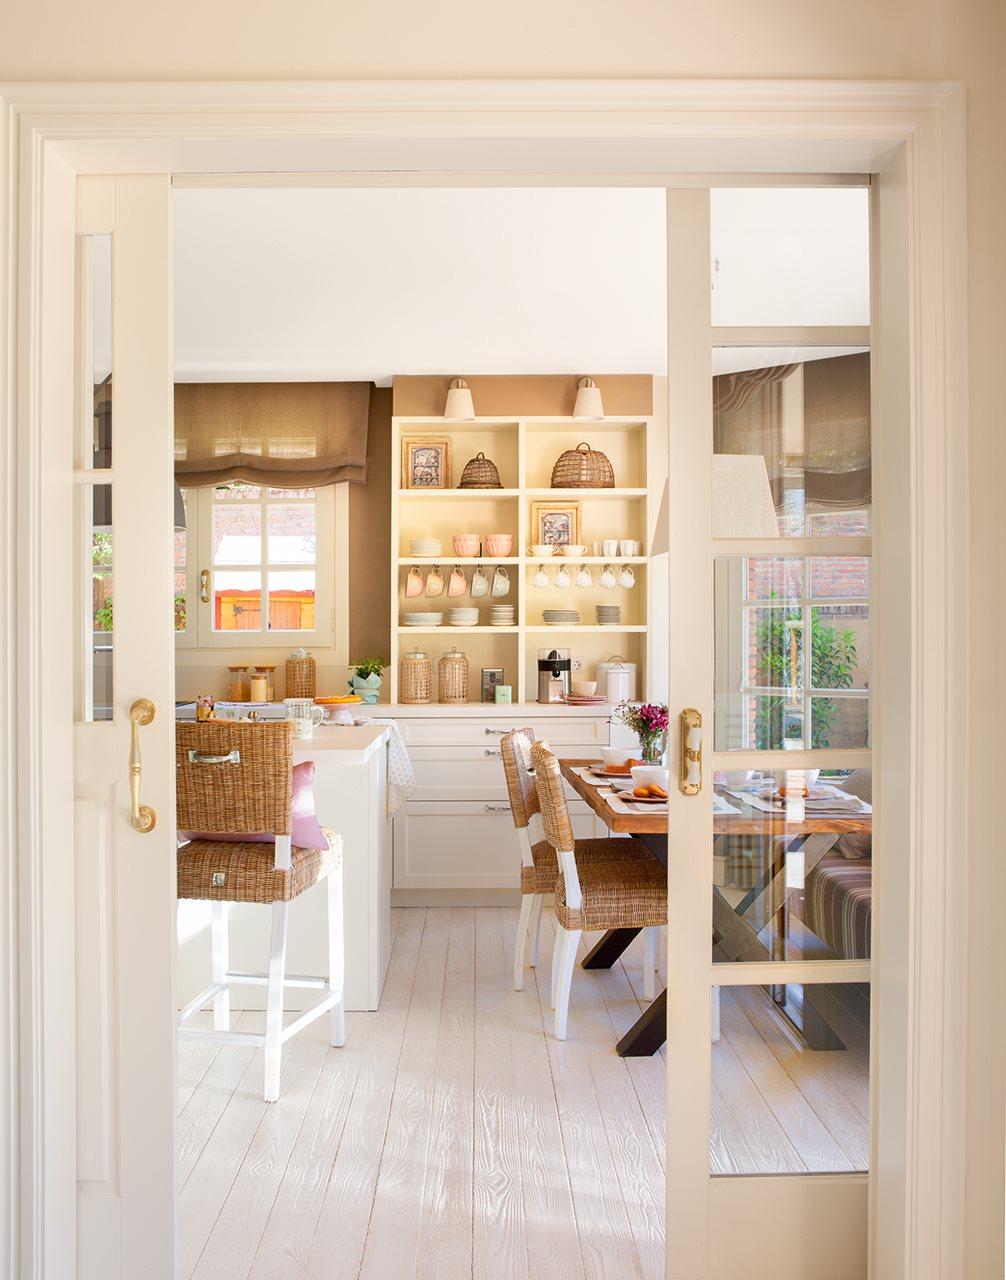 Puertas correderas de cristal de madera o empotradas for Puerta corredera cocina